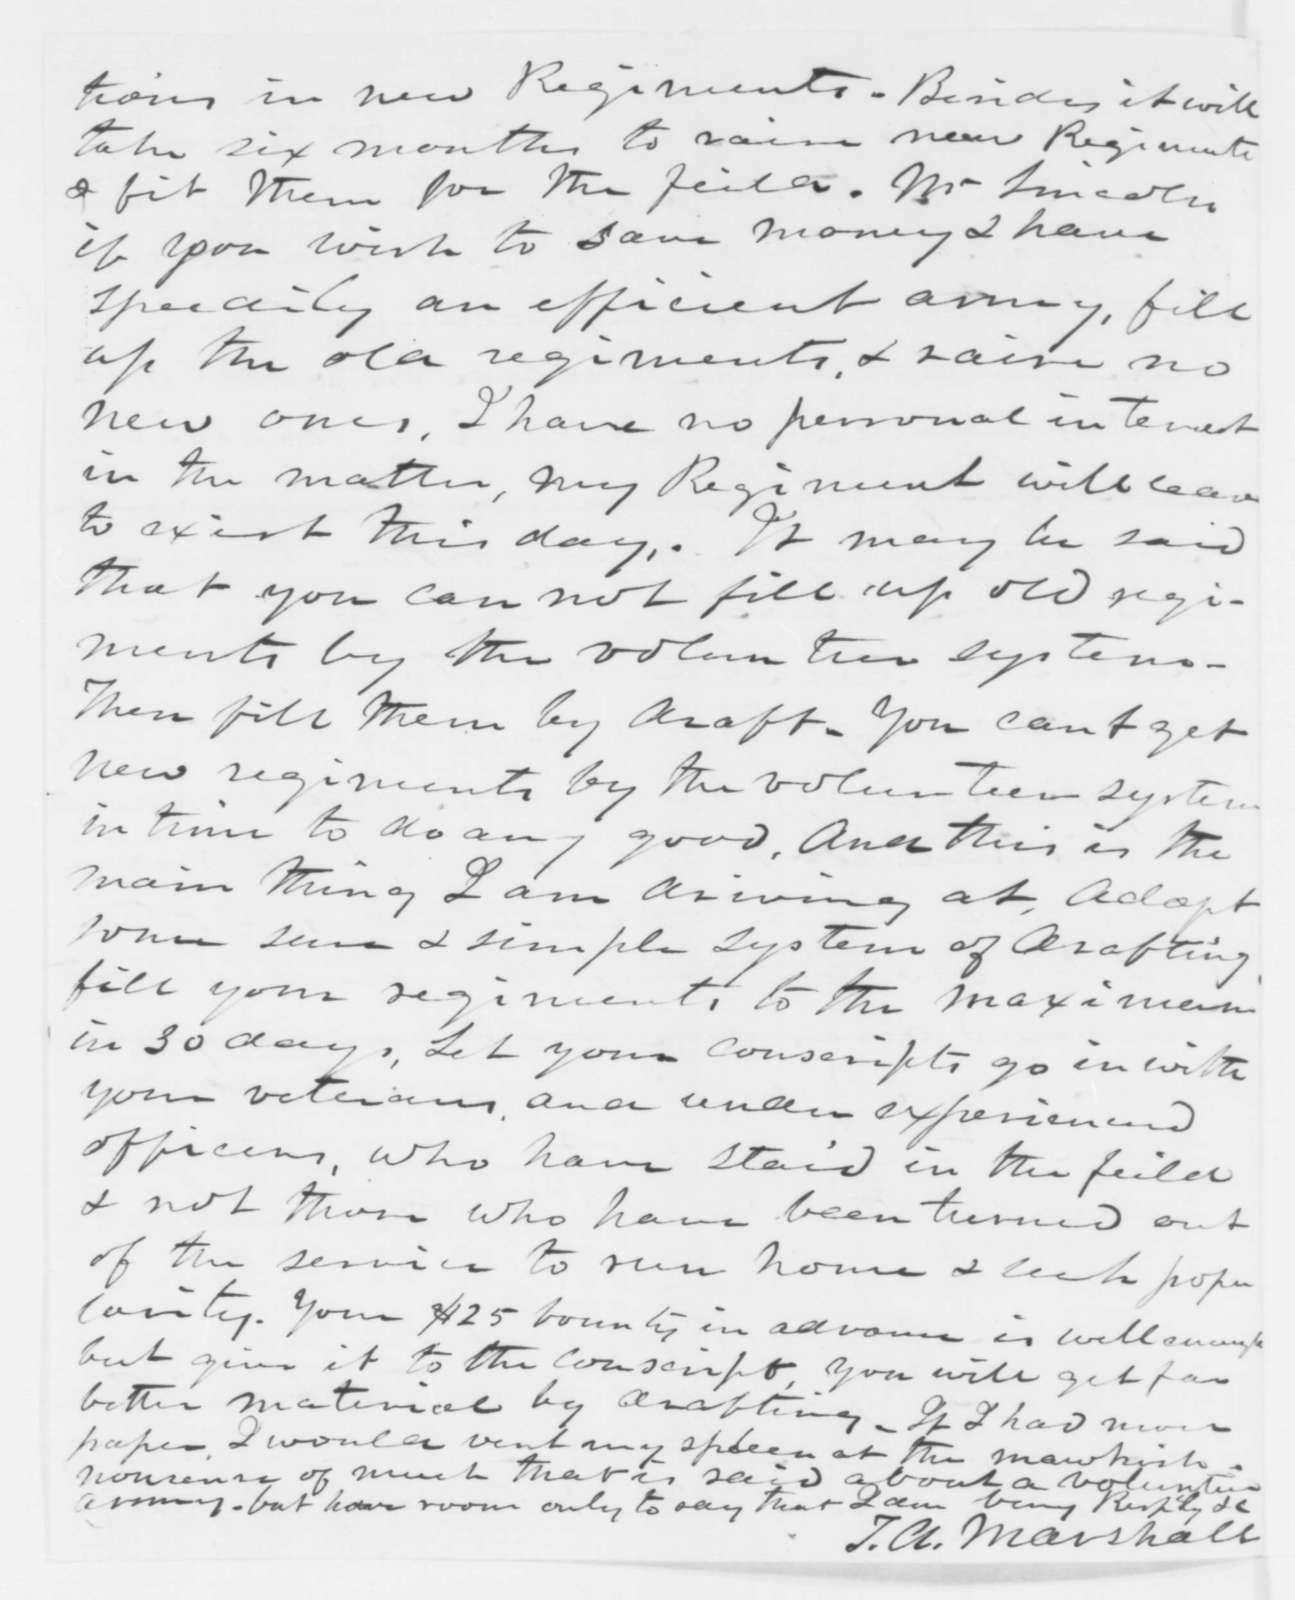 Thomas A. Marshall to Abraham Lincoln, Tuesday, July 15, 1862  (Military affairs)